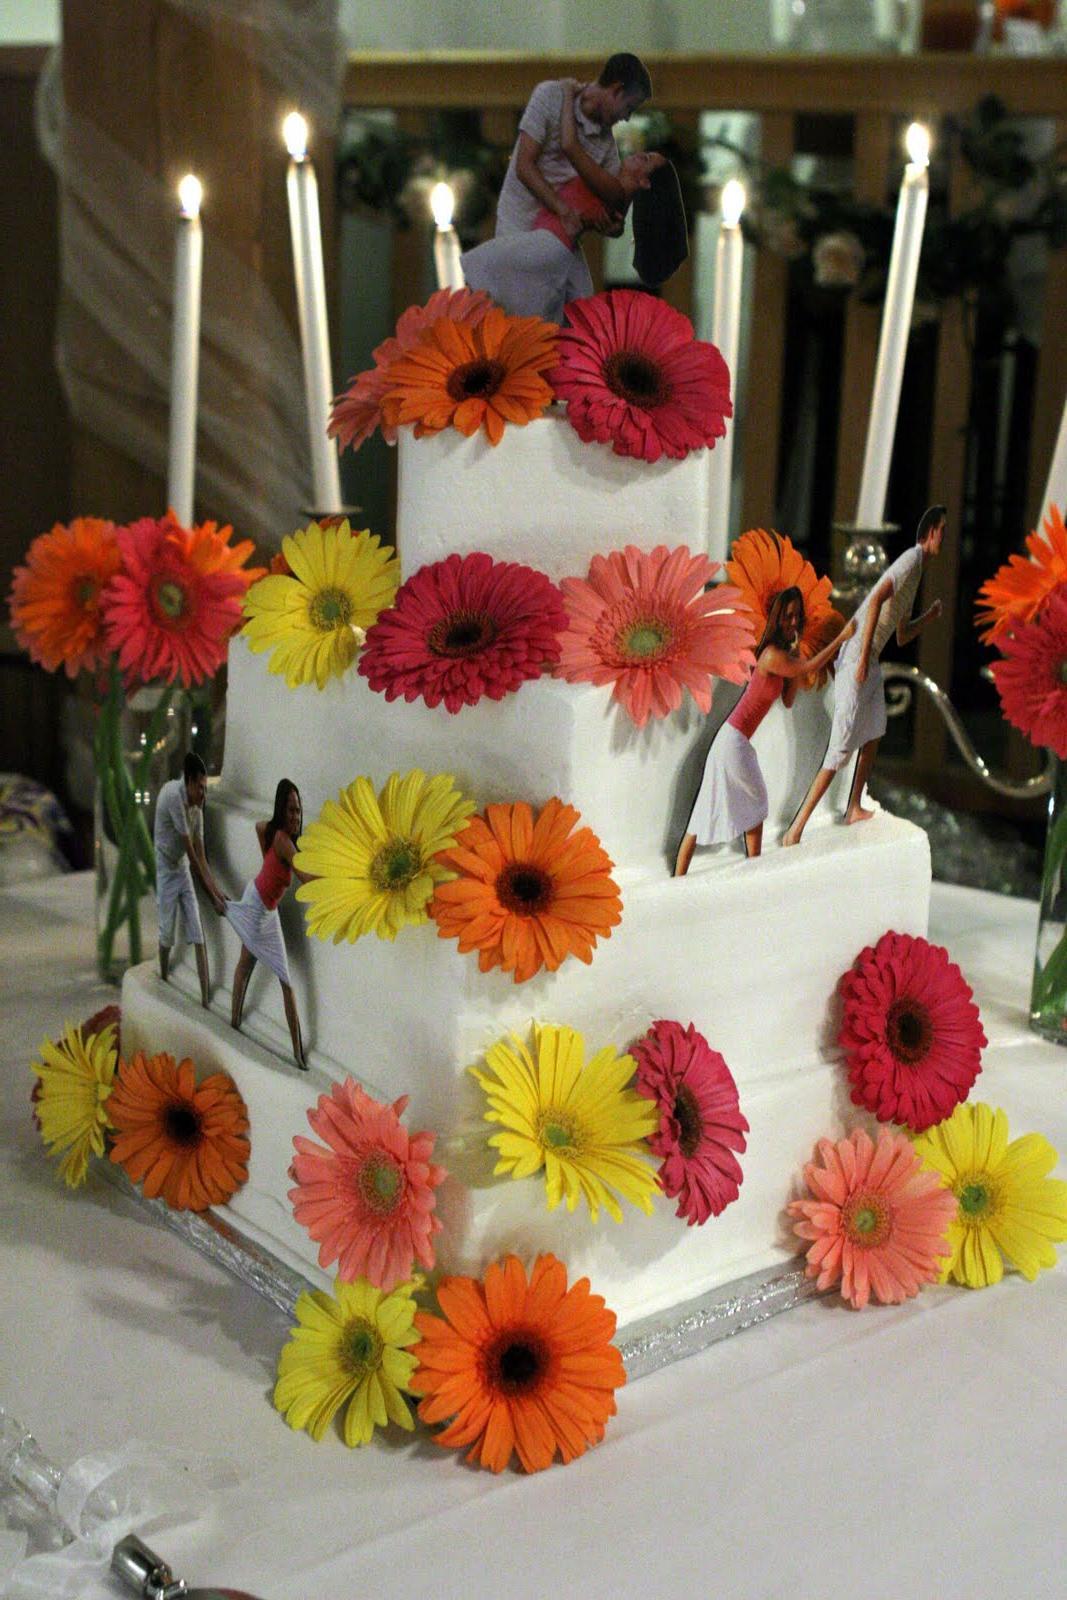 cake topper poses.